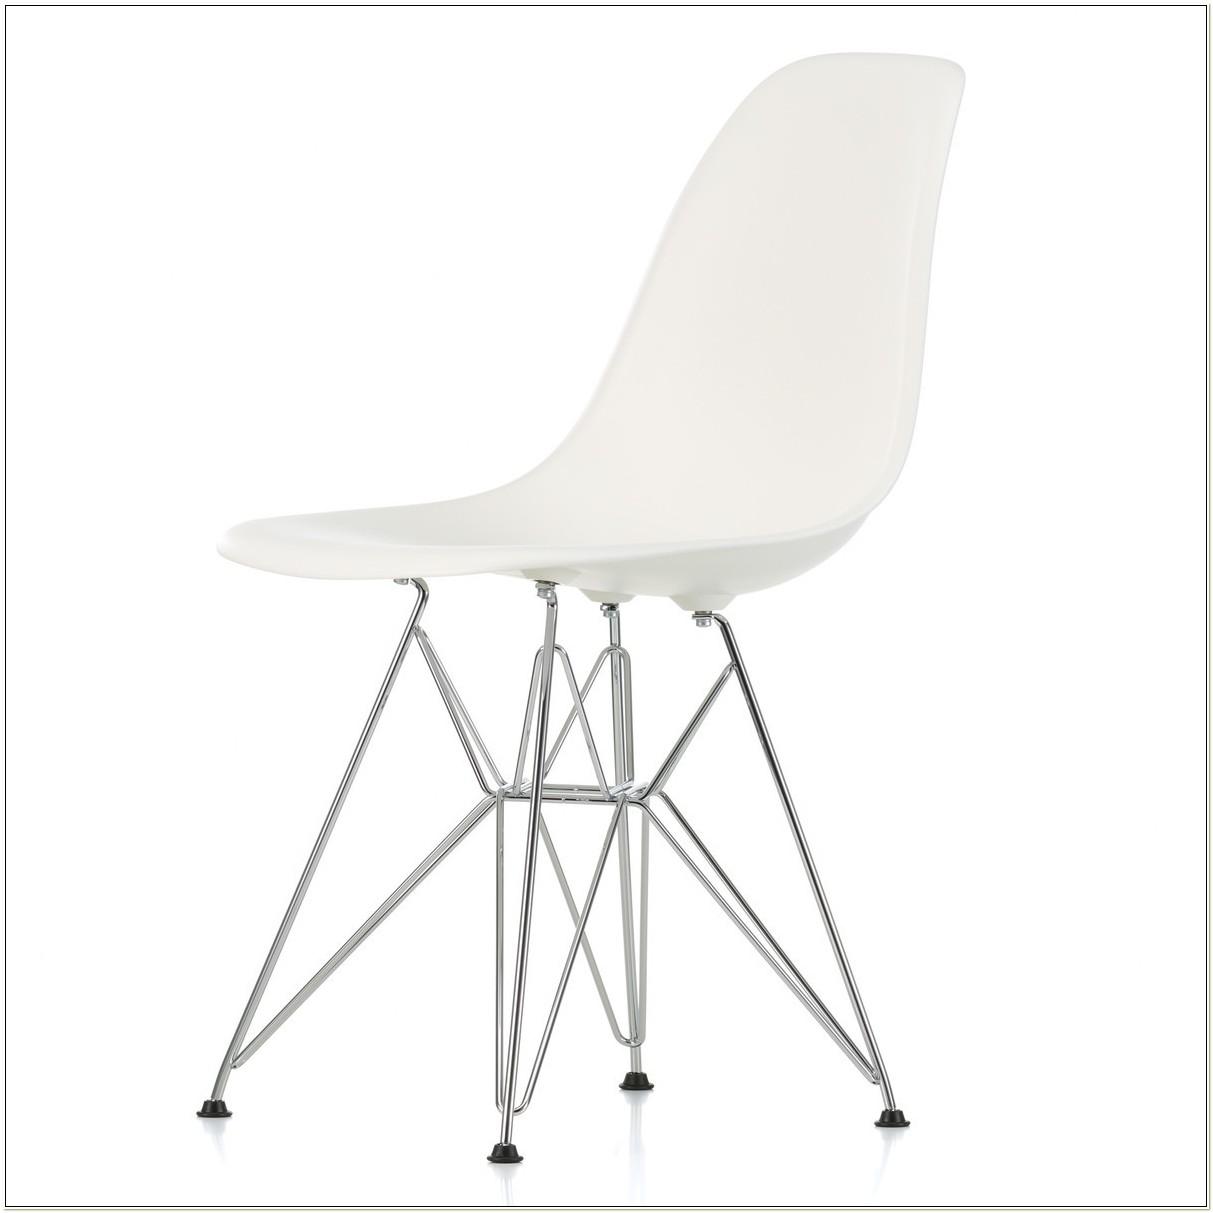 Eames Plastic Side Chair Dsr Vitra